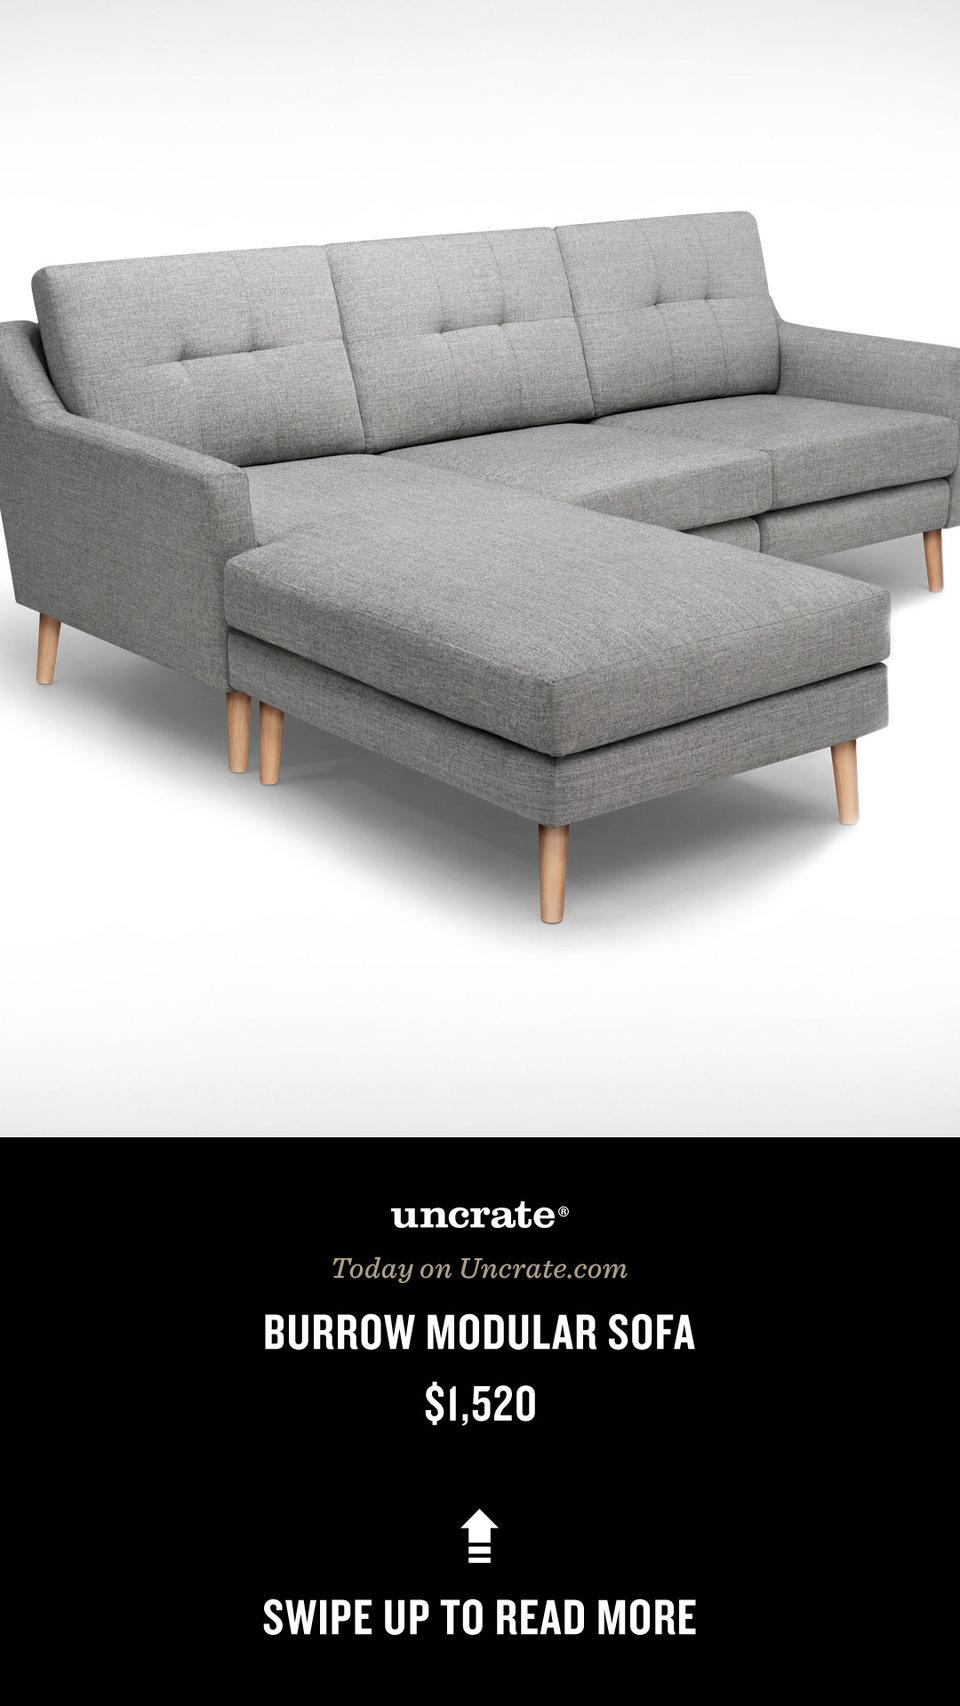 Awe Inspiring Le Sofa Modulaire De Burrow Uncrate Machost Co Dining Chair Design Ideas Machostcouk